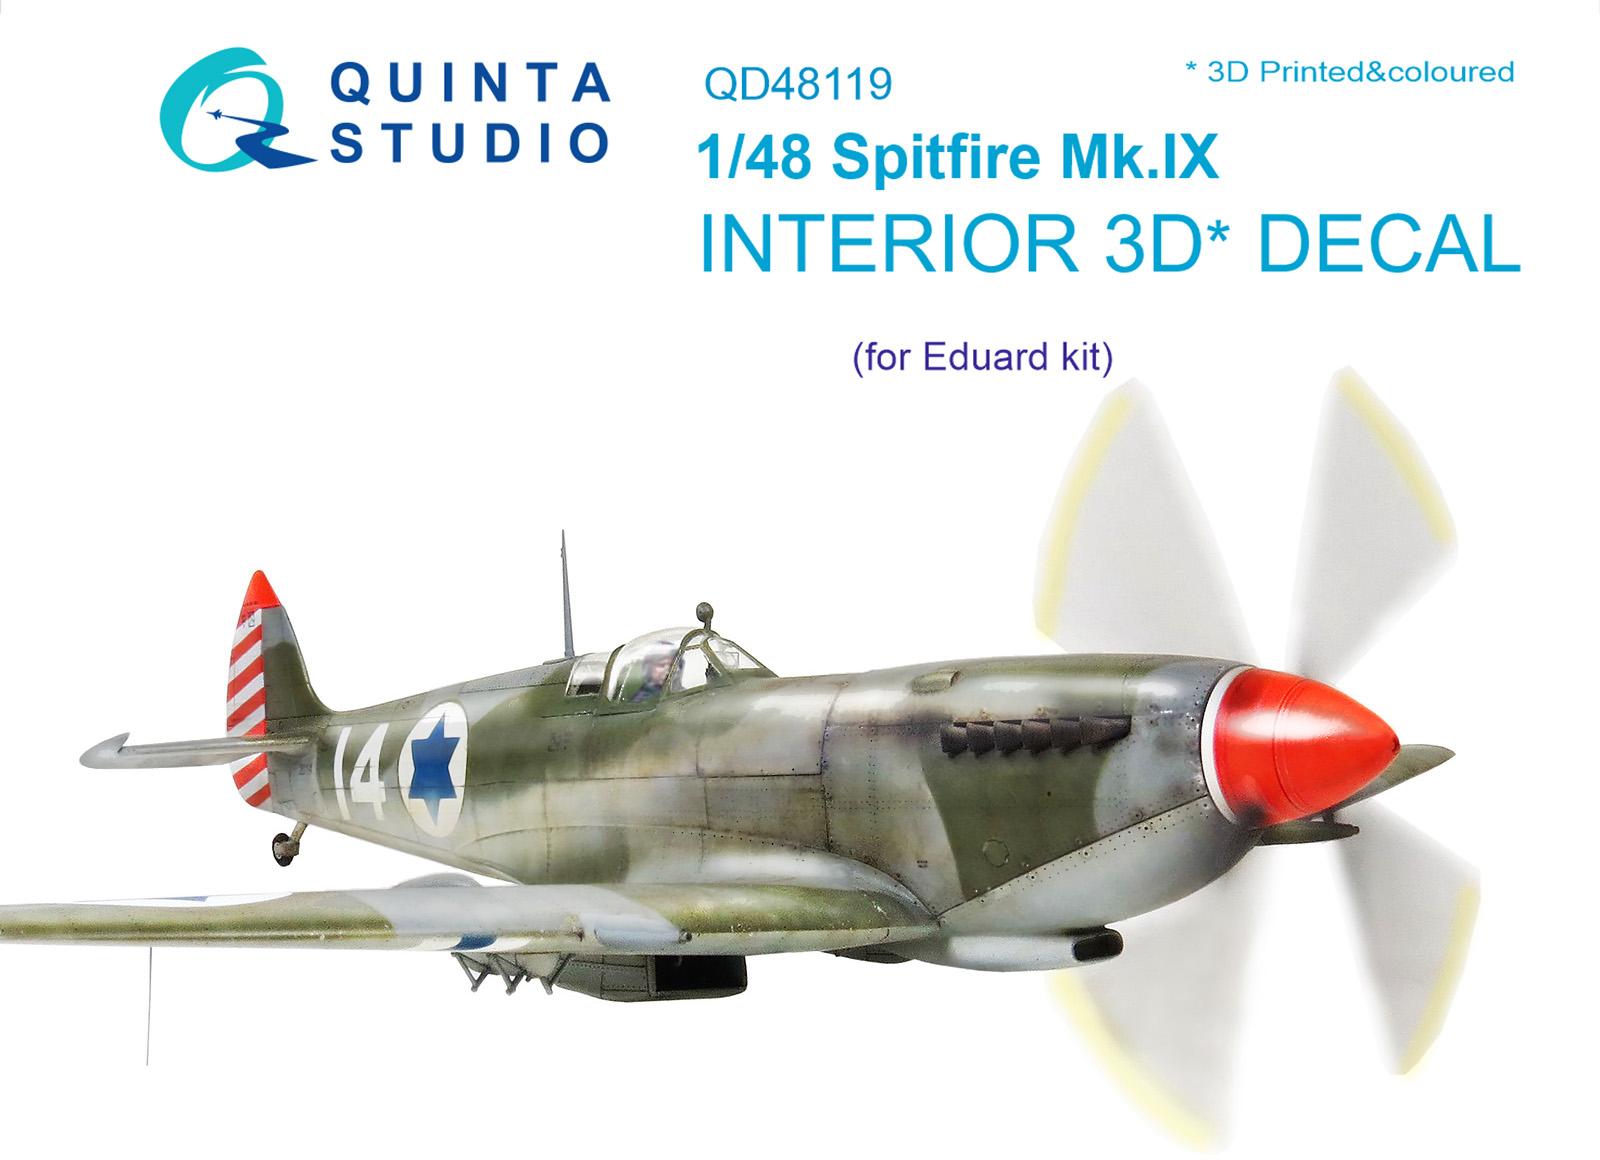 QD48119